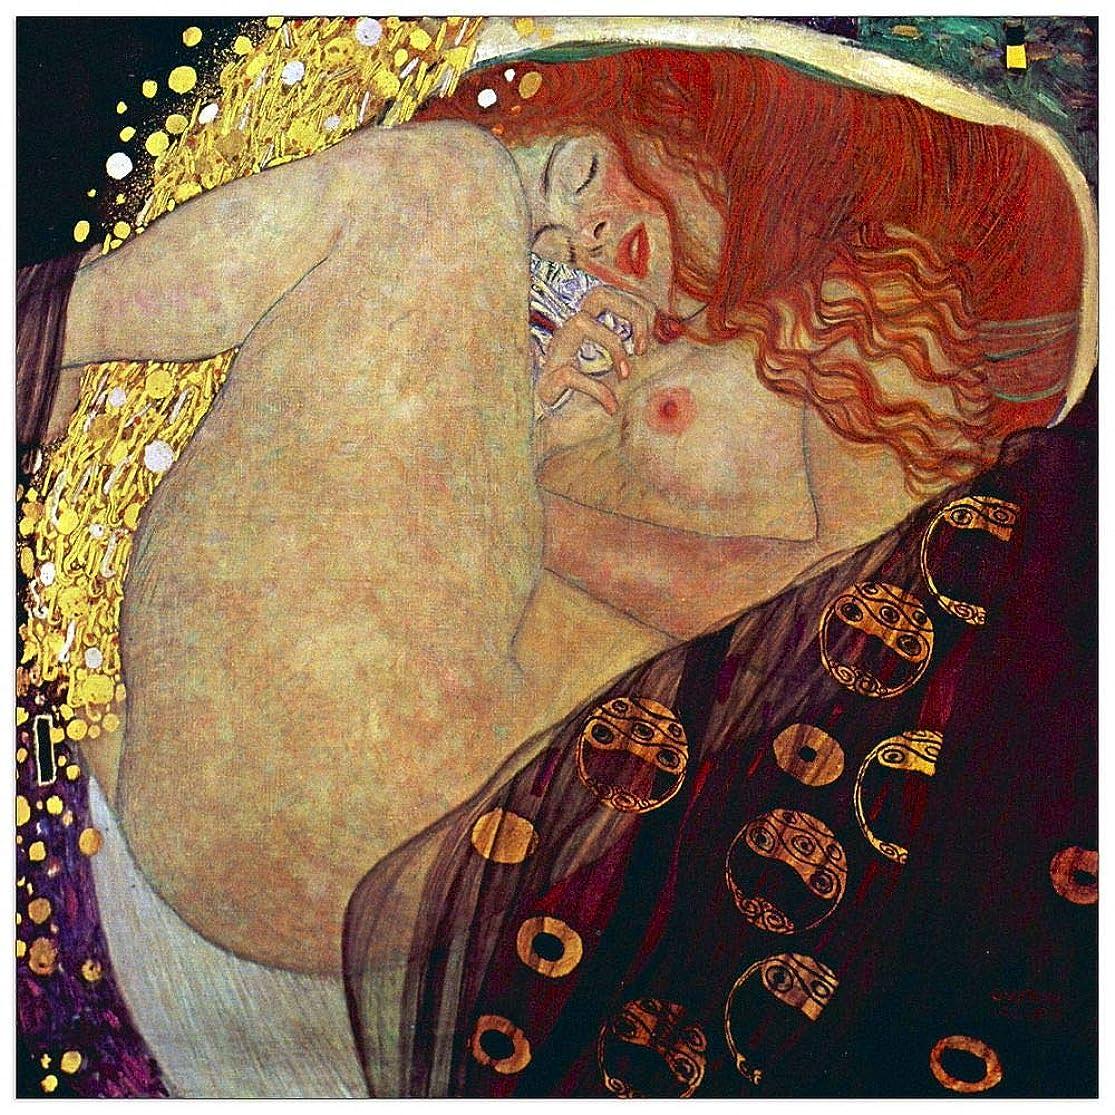 ArtPlaza TW90266 Klimt Gustav - Danae Decorative Panel 31.5x31.5 Inch Multicolored bdwgetsd8